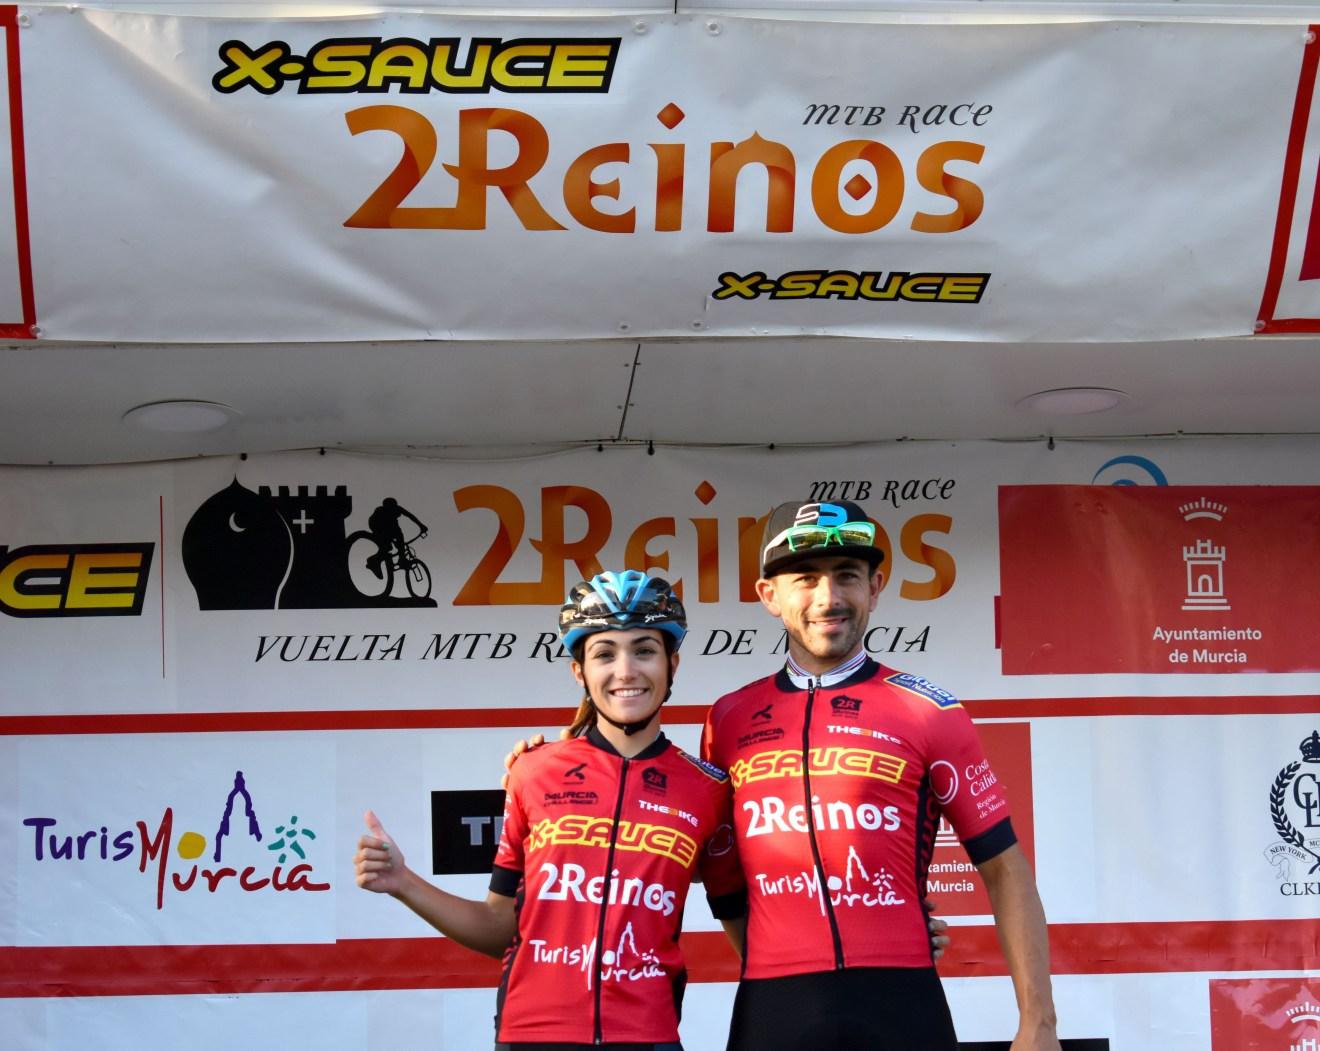 2Reinos X-Sauce